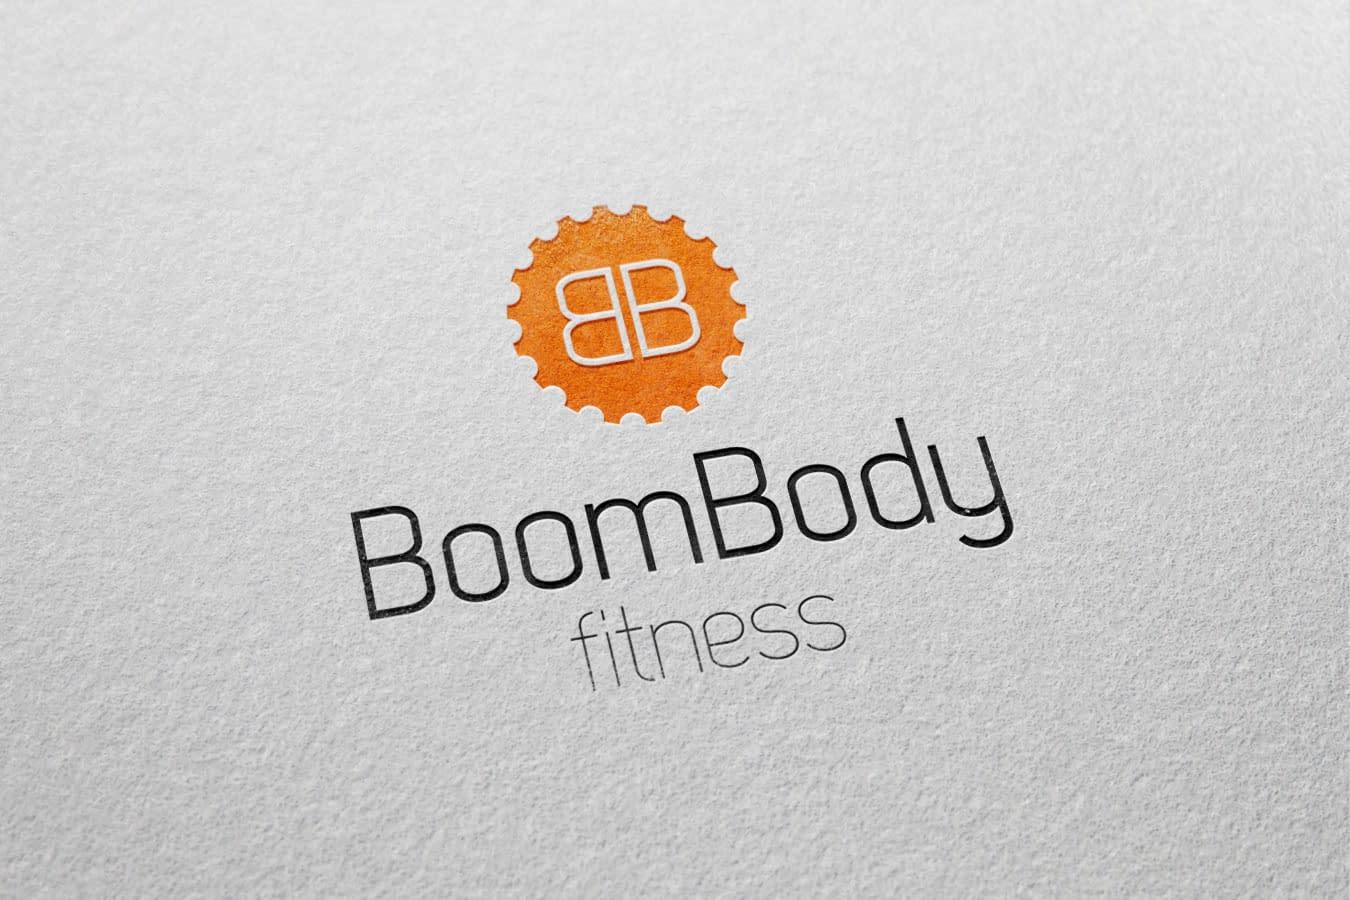 logos_boombody1